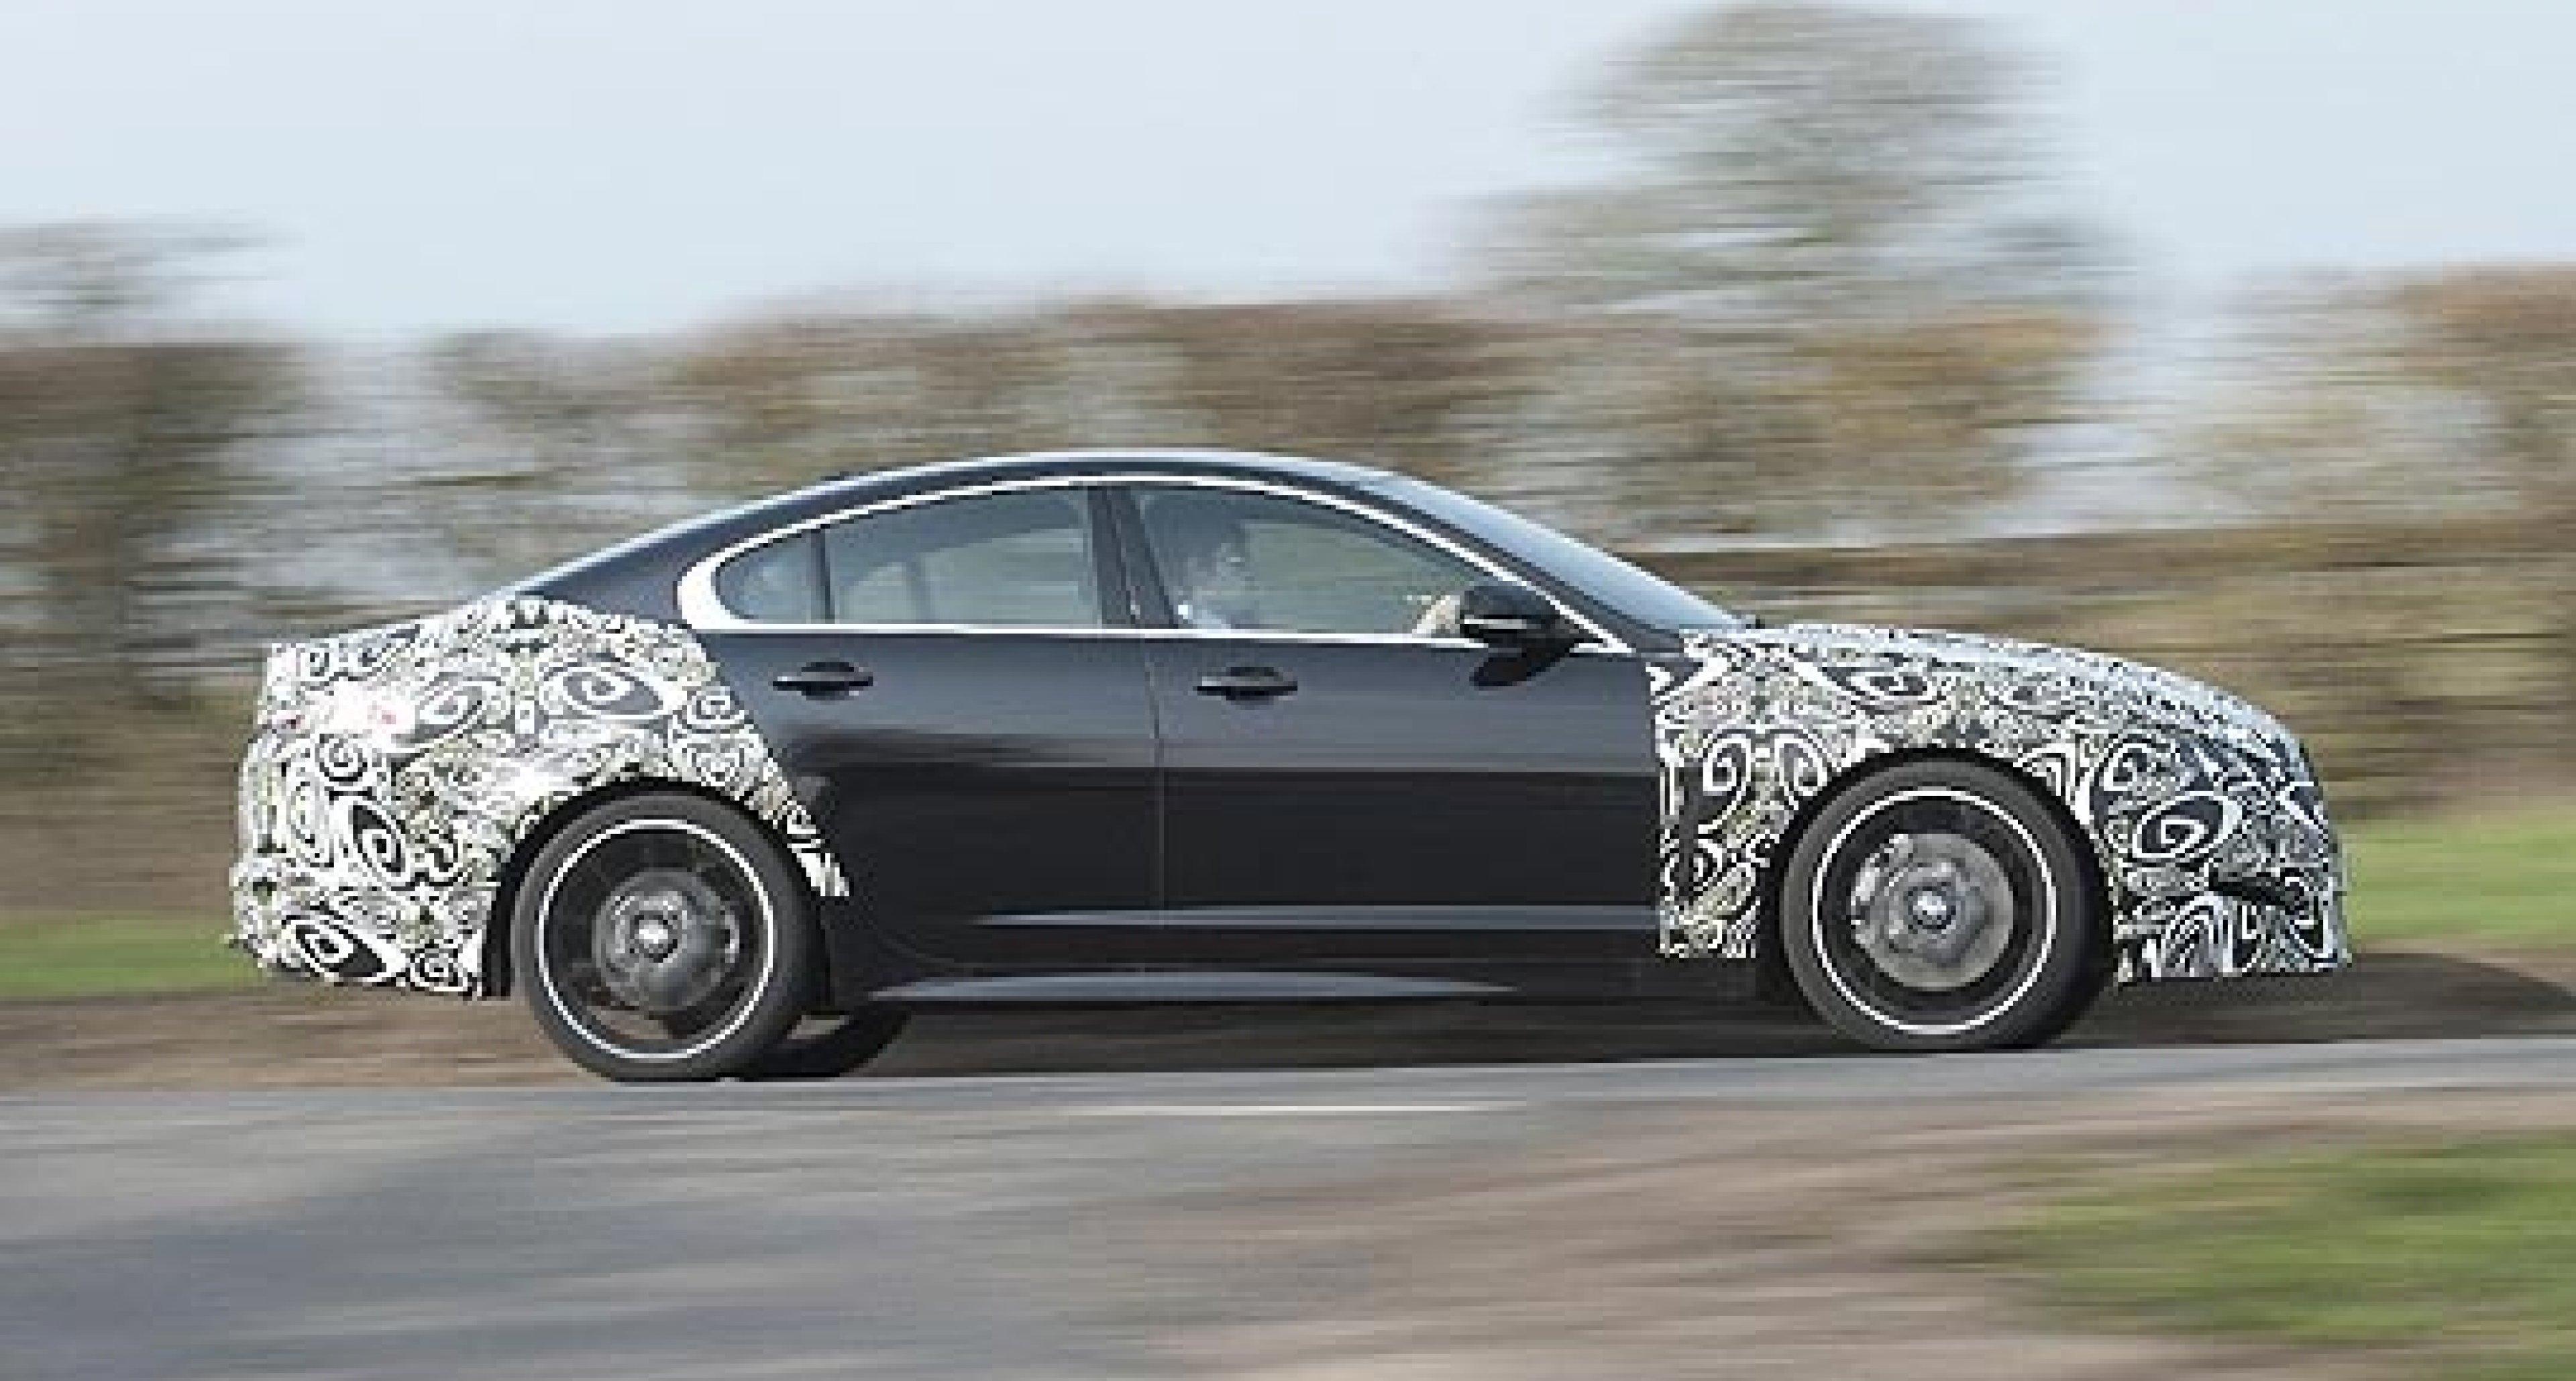 Jaguar XF 2.2-Litre Diesel to Offer 52.3mpg and 140mph